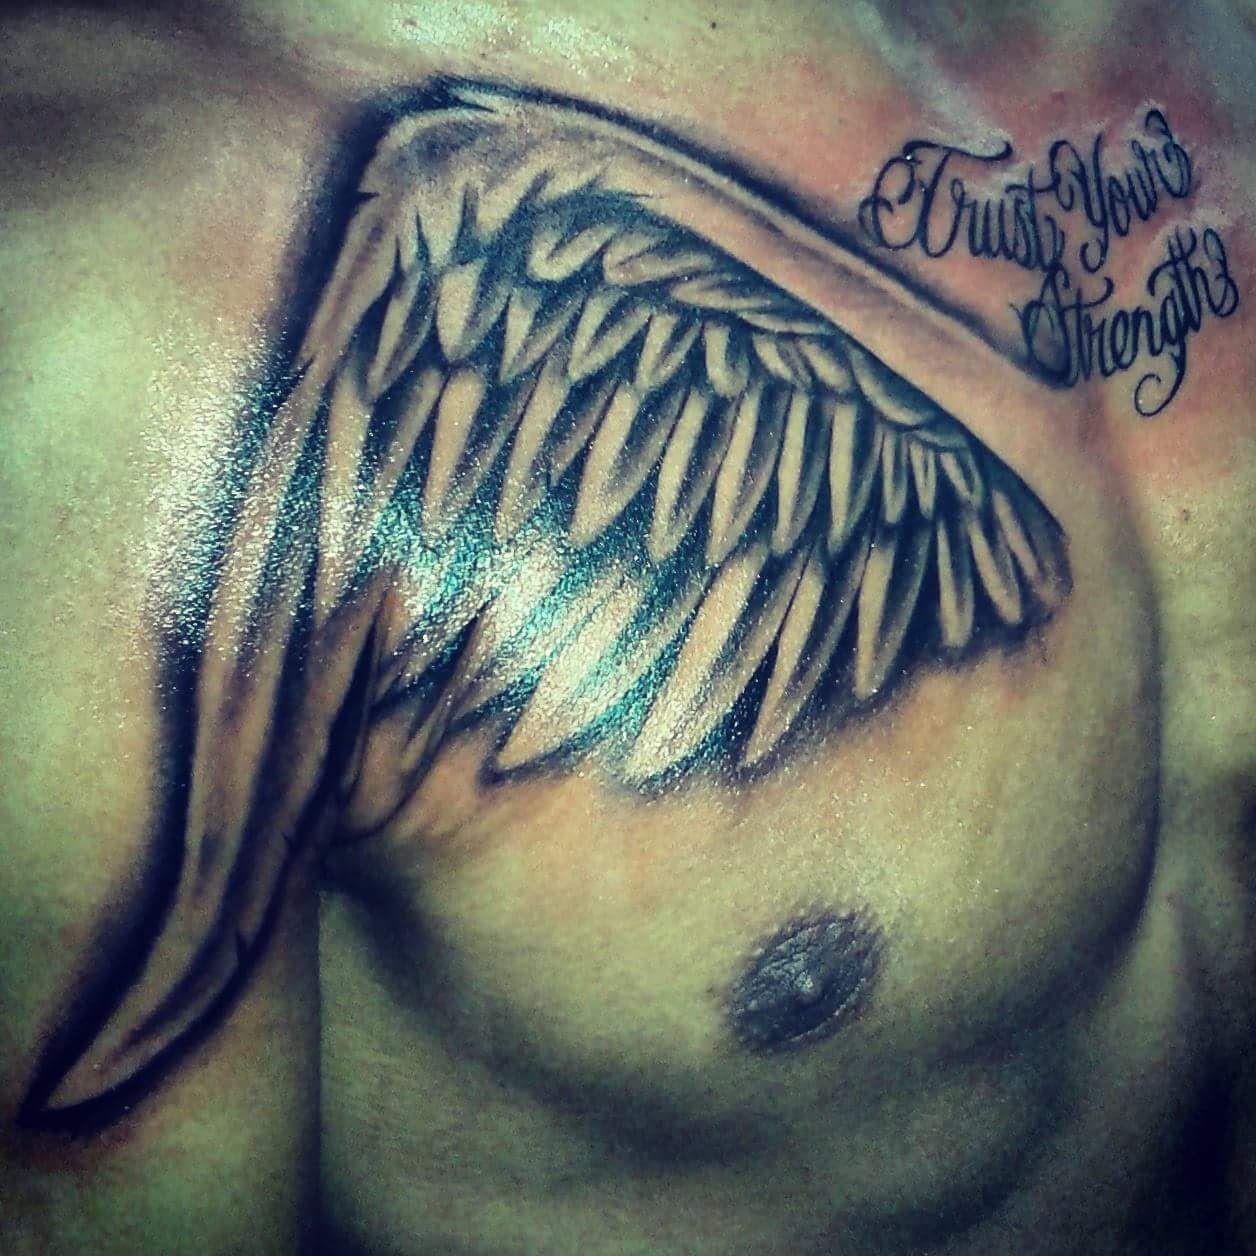 Rey Figueroa tattoos , 1869 Cobb pkwy S Marietta Ga 30060